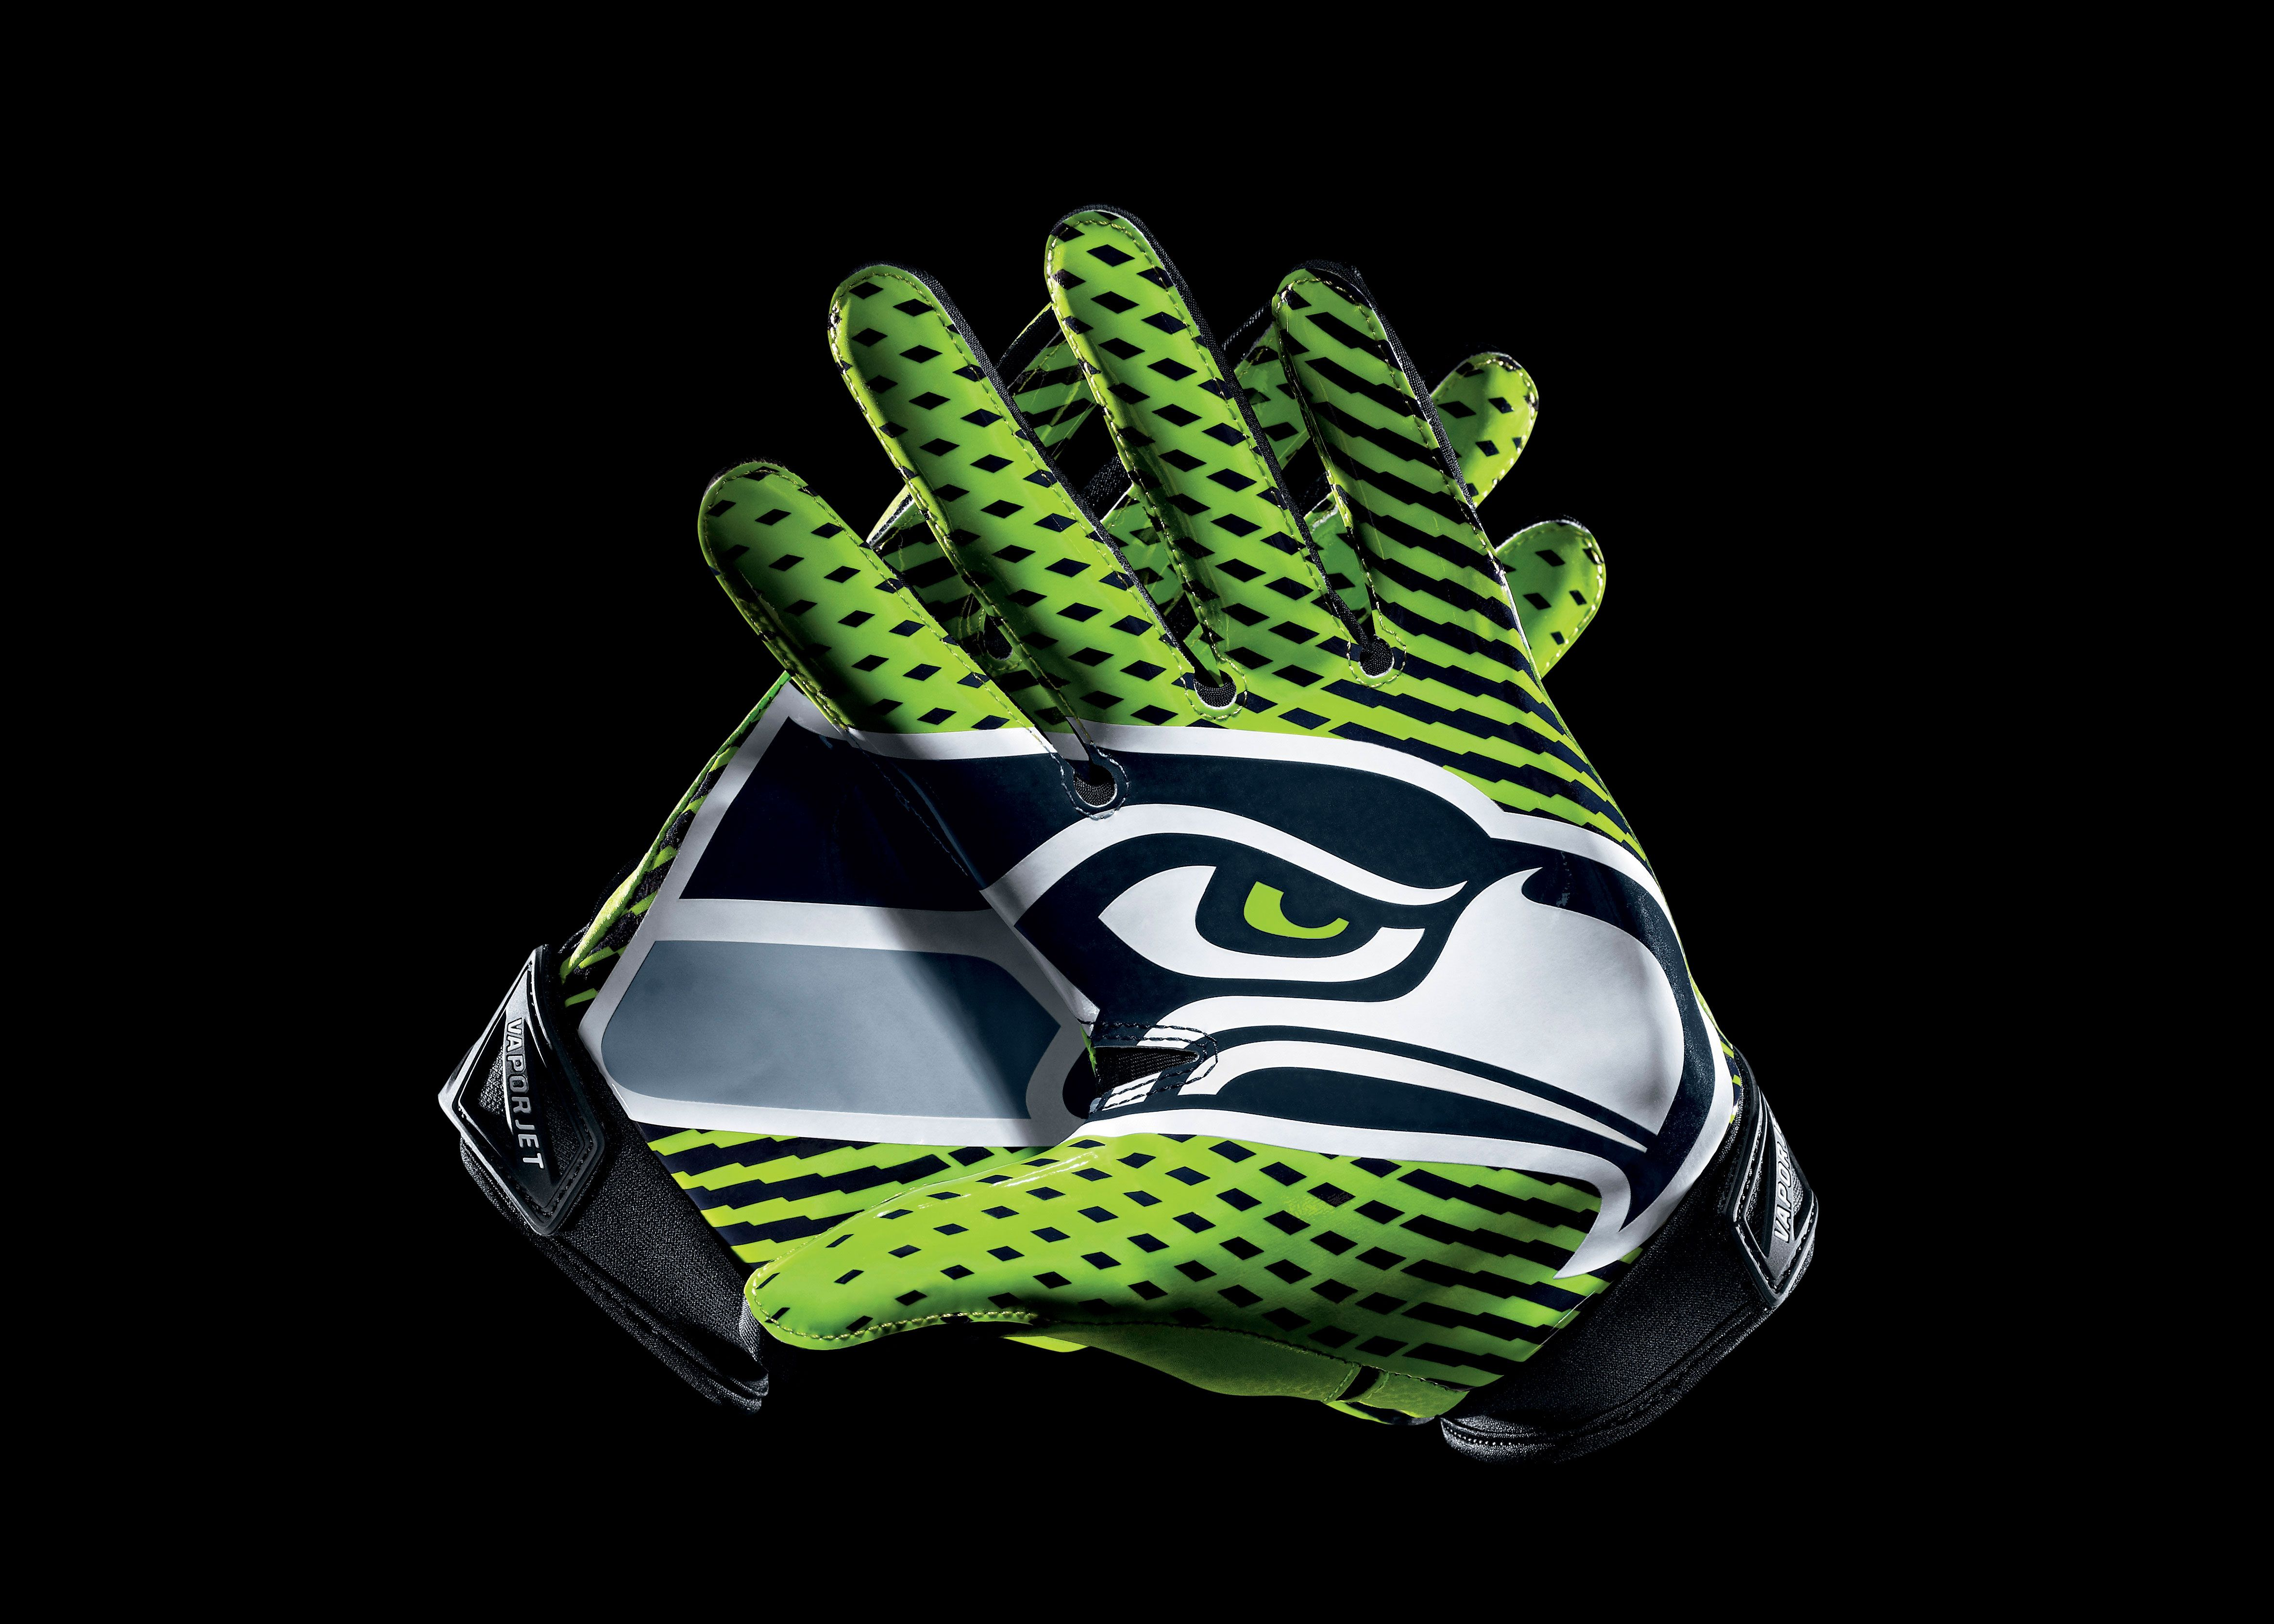 Seattle Seahawks Nike Vapor Jet Glove Picture | Cool Stuff ...